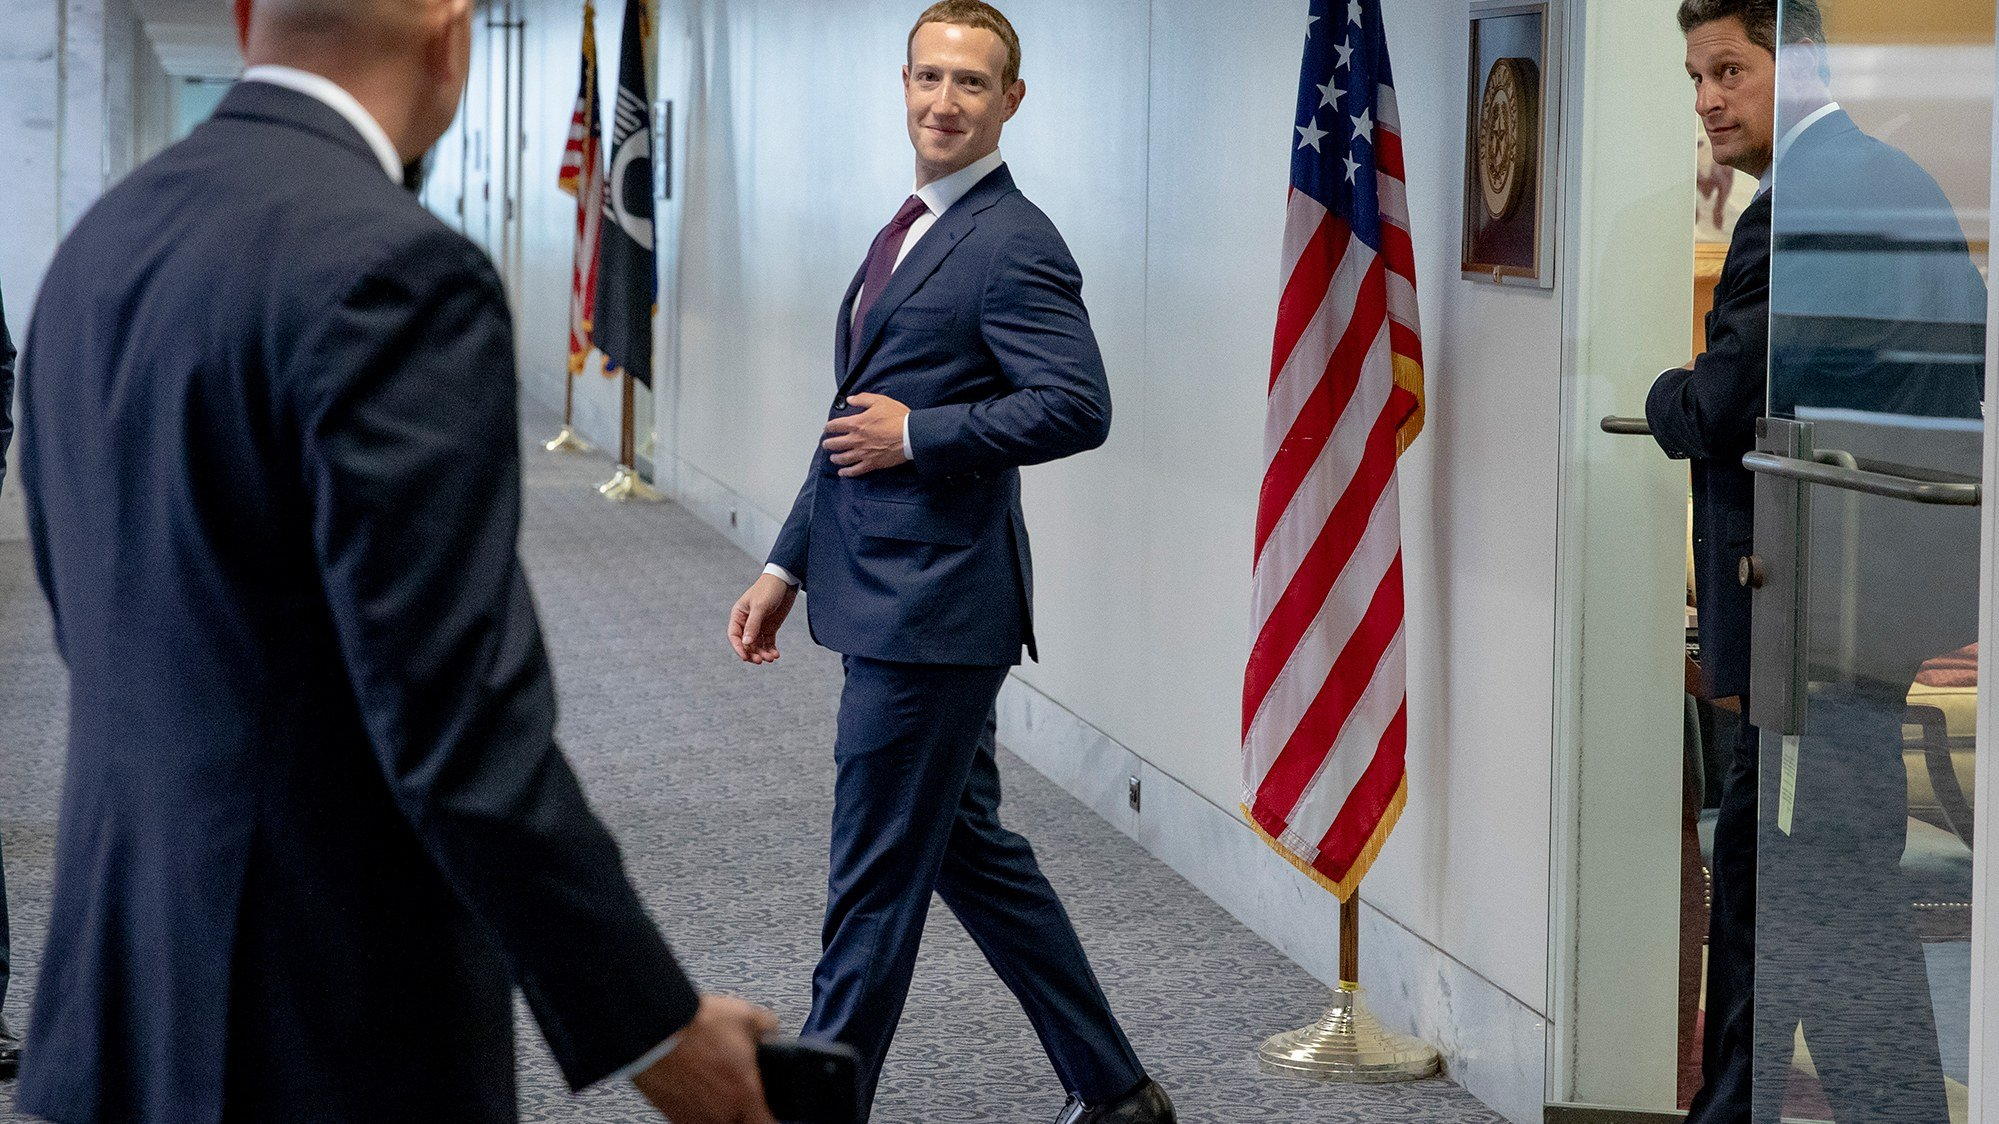 Facebook CEO Mark Zuckerberg seen here wearing a human suit.